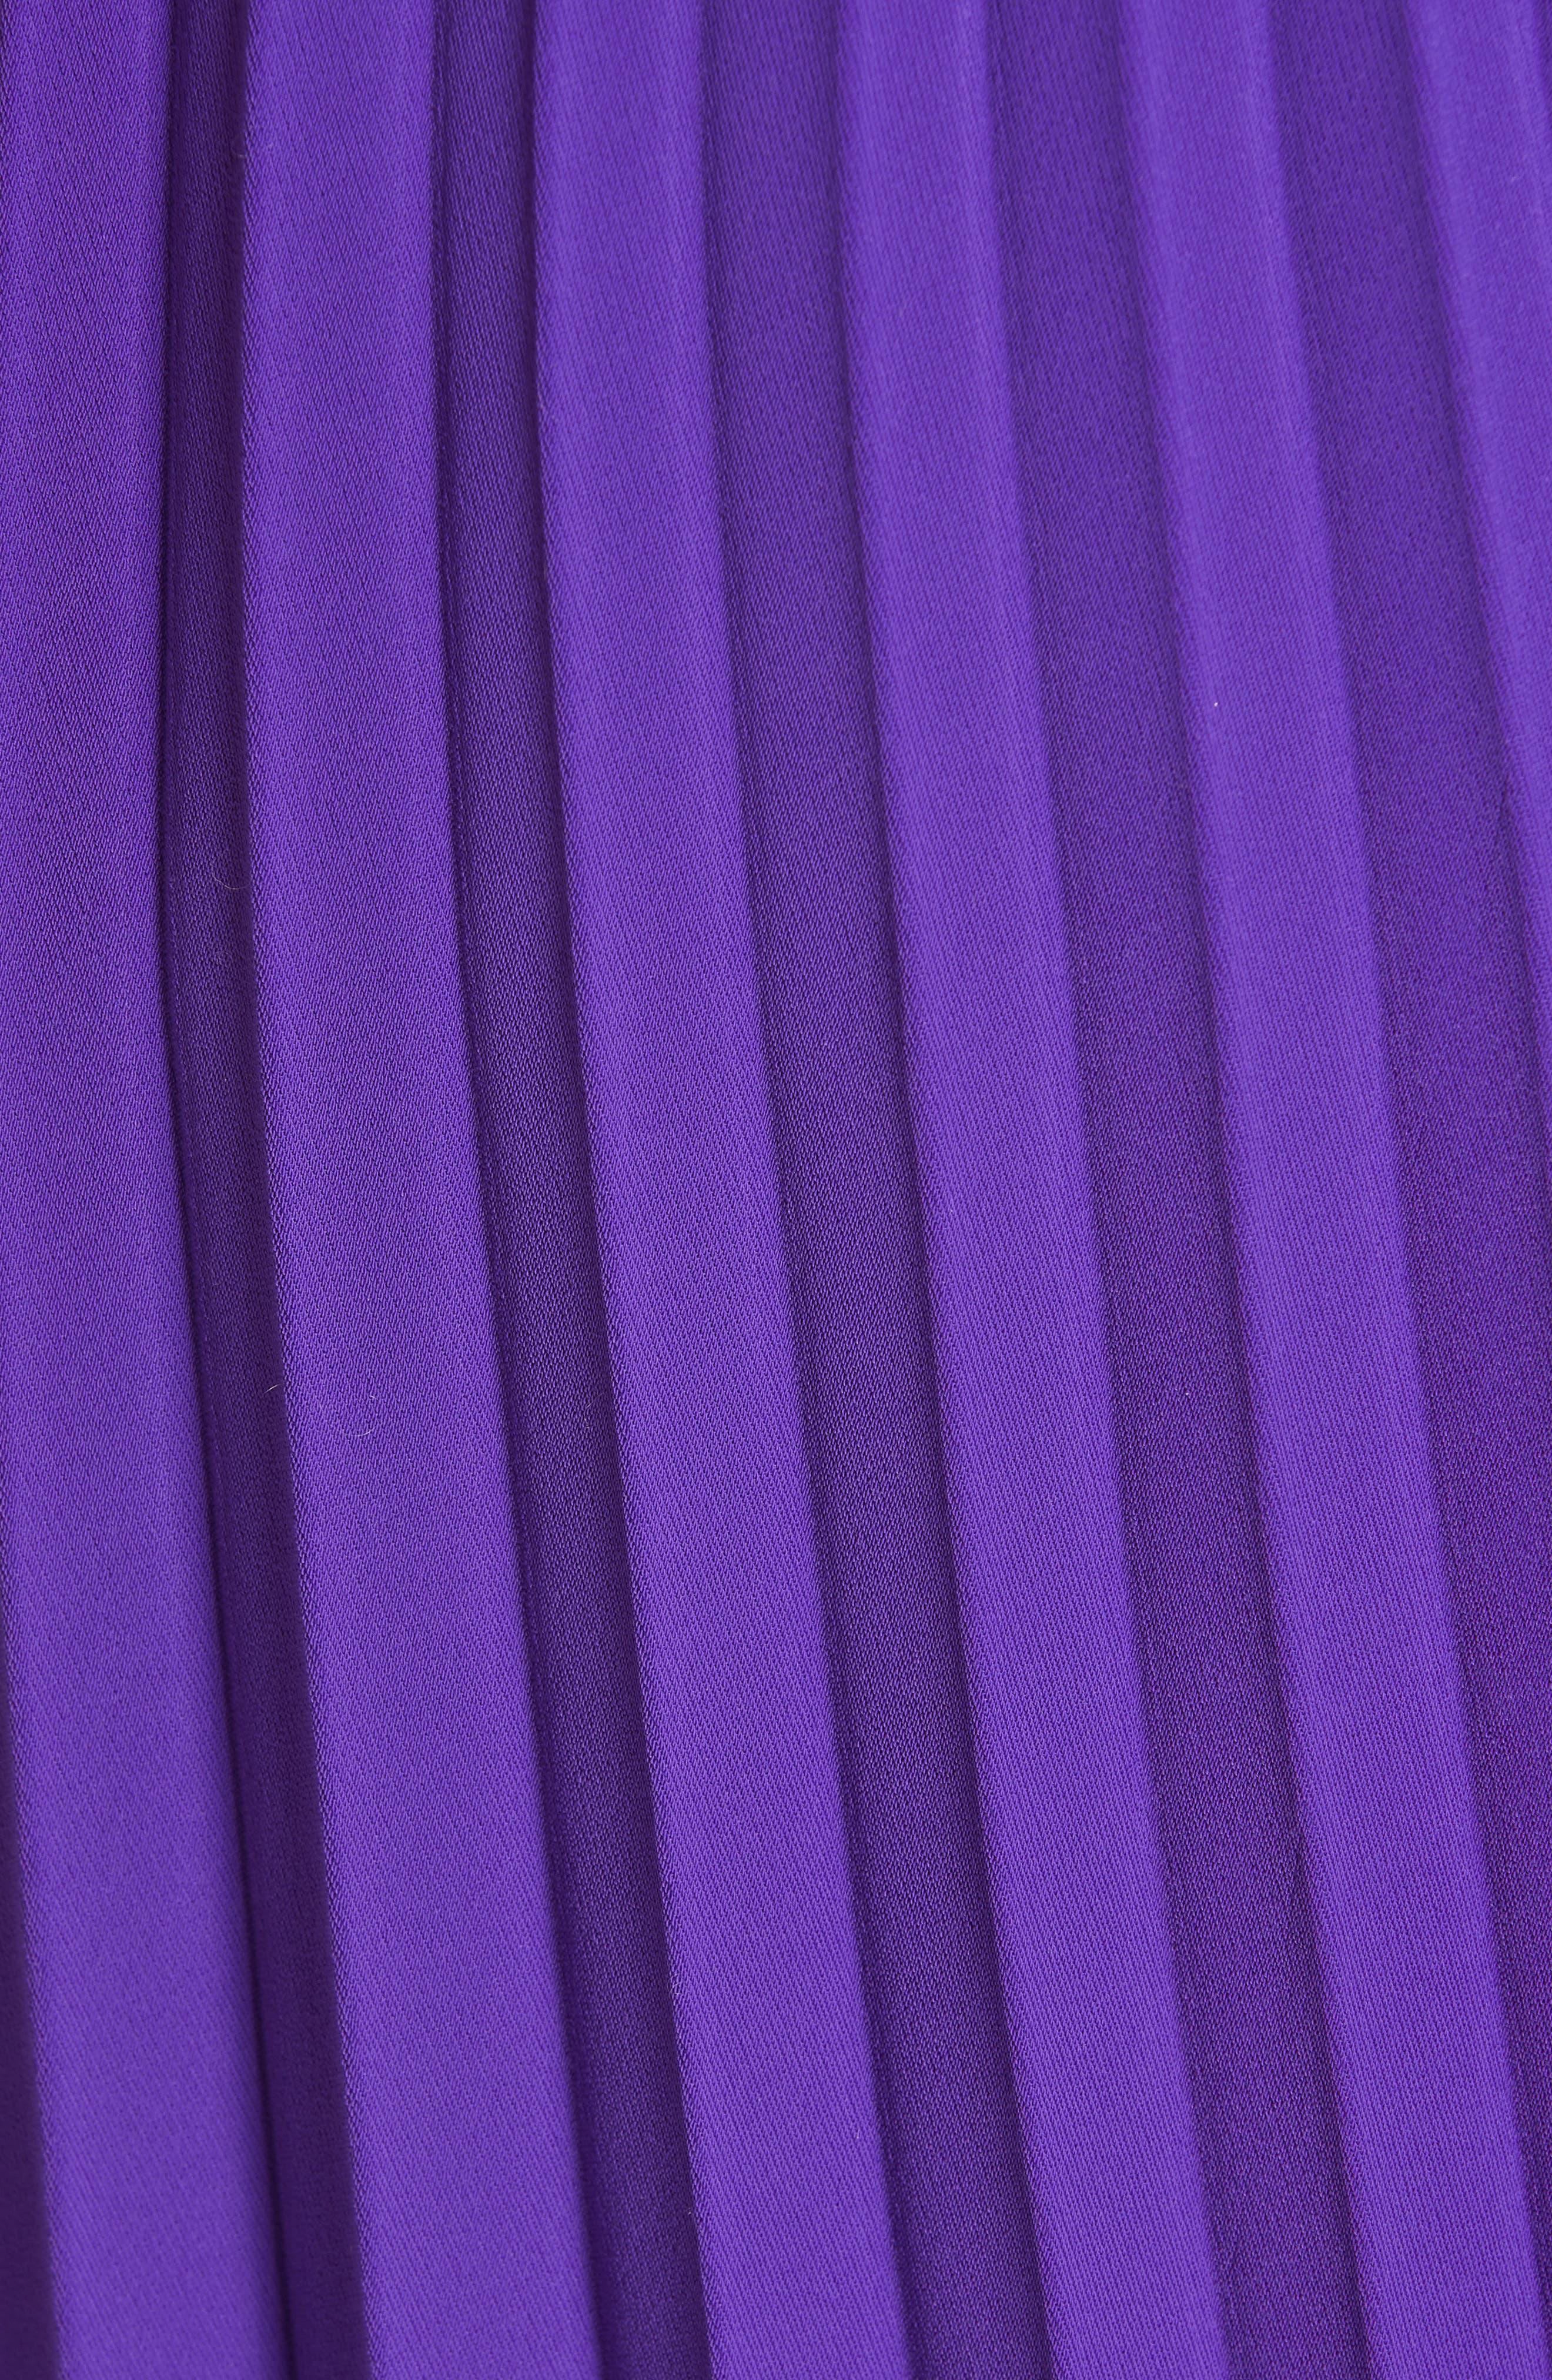 Fancy Asymmetrical Pleated Crepe Skirt,                             Alternate thumbnail 5, color,                             ULTRAVIOLET